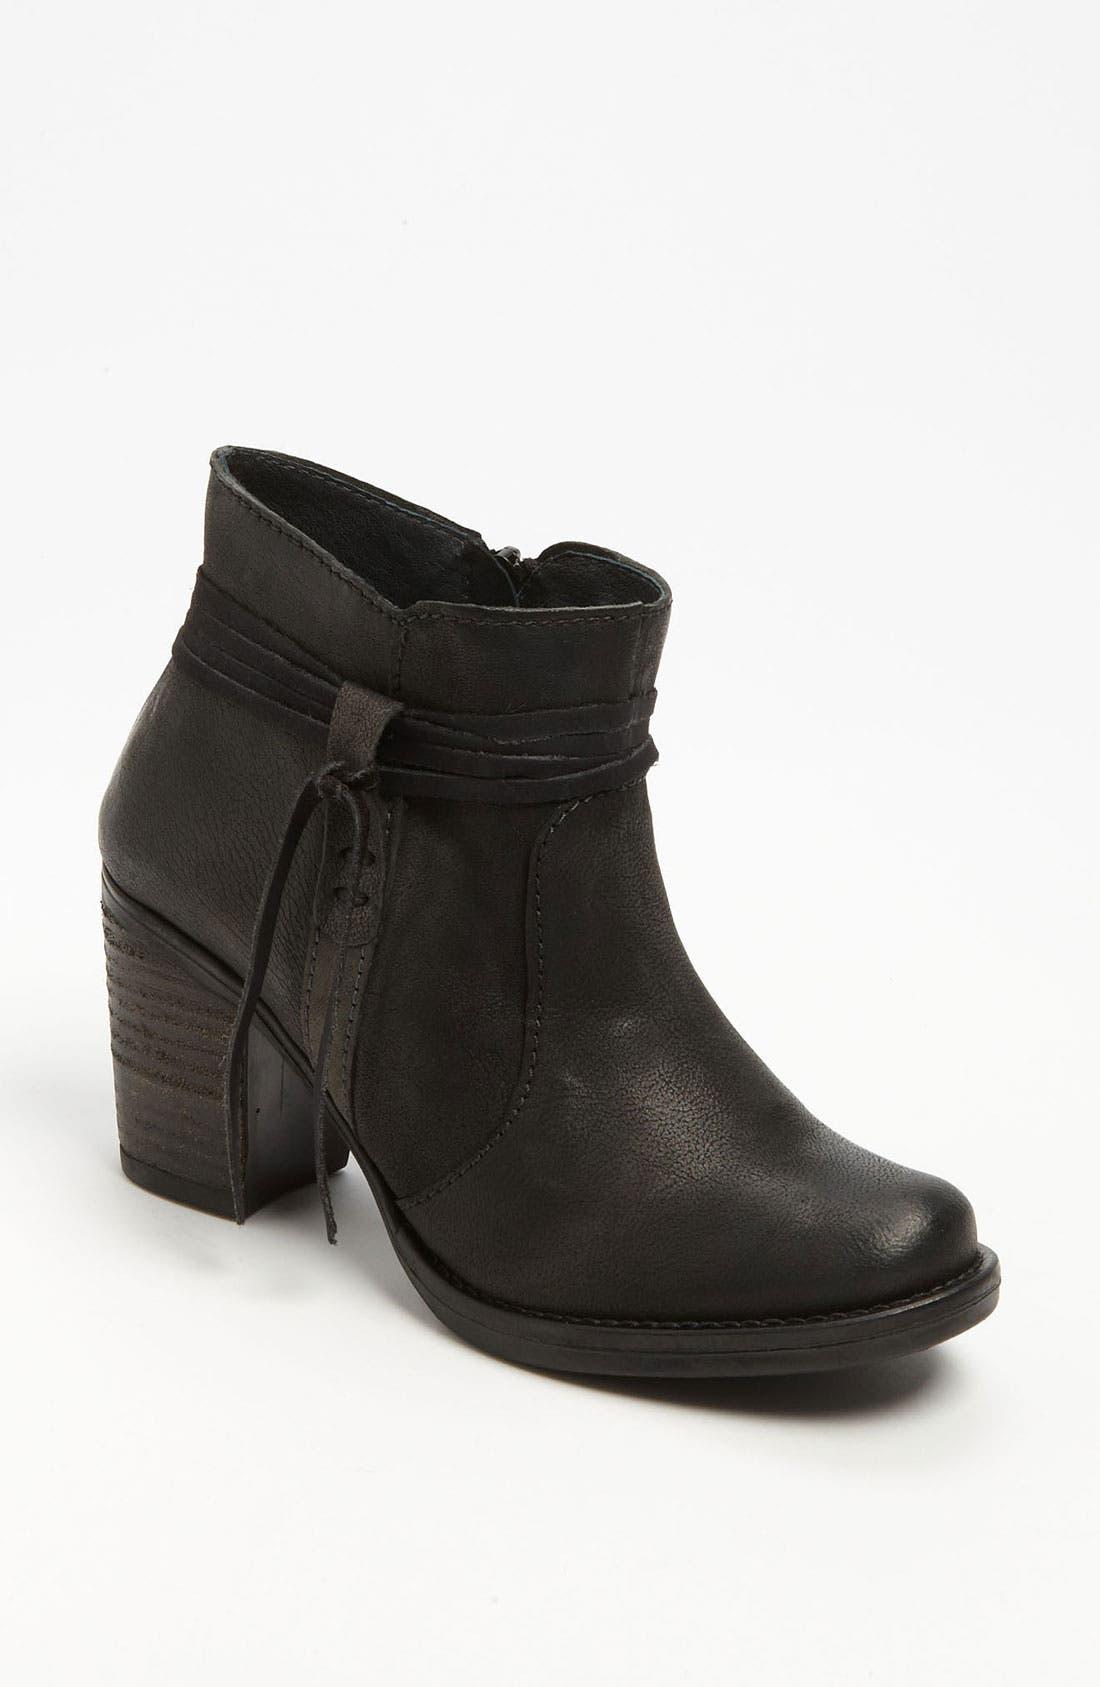 Main Image - Miz Mooz 'Melba' Boot